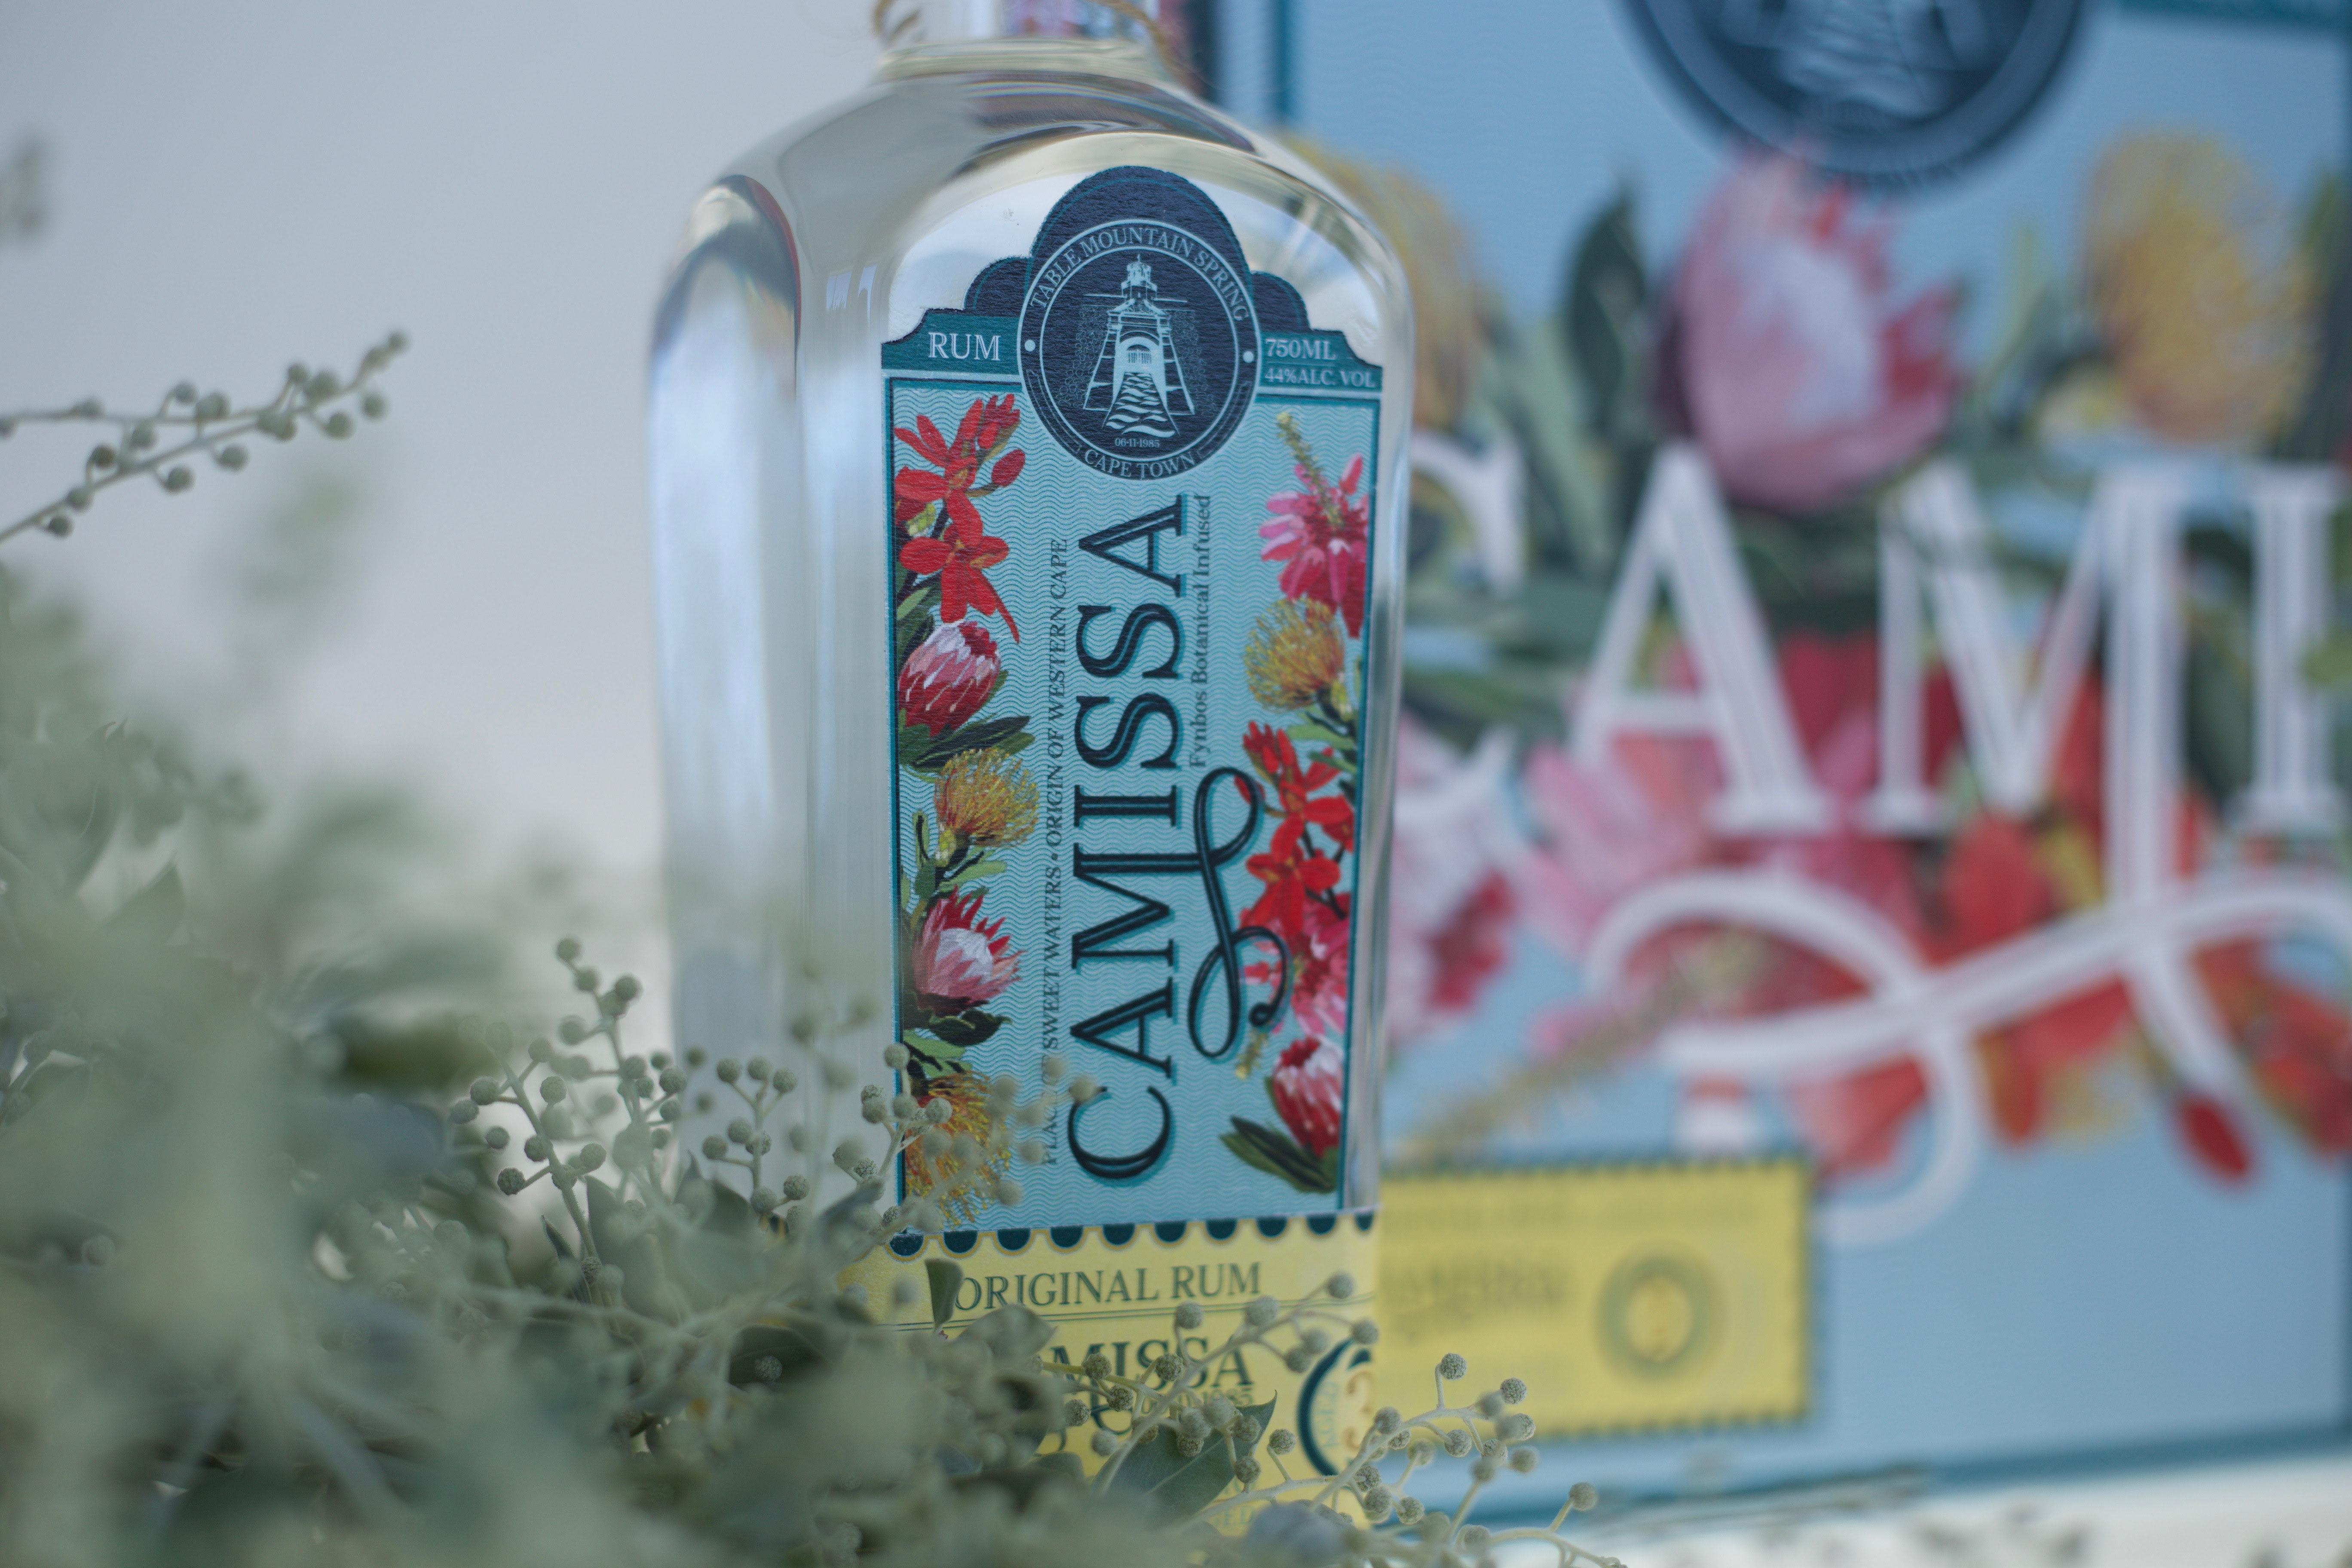 Camissa Rum Label & Promotional Packaging